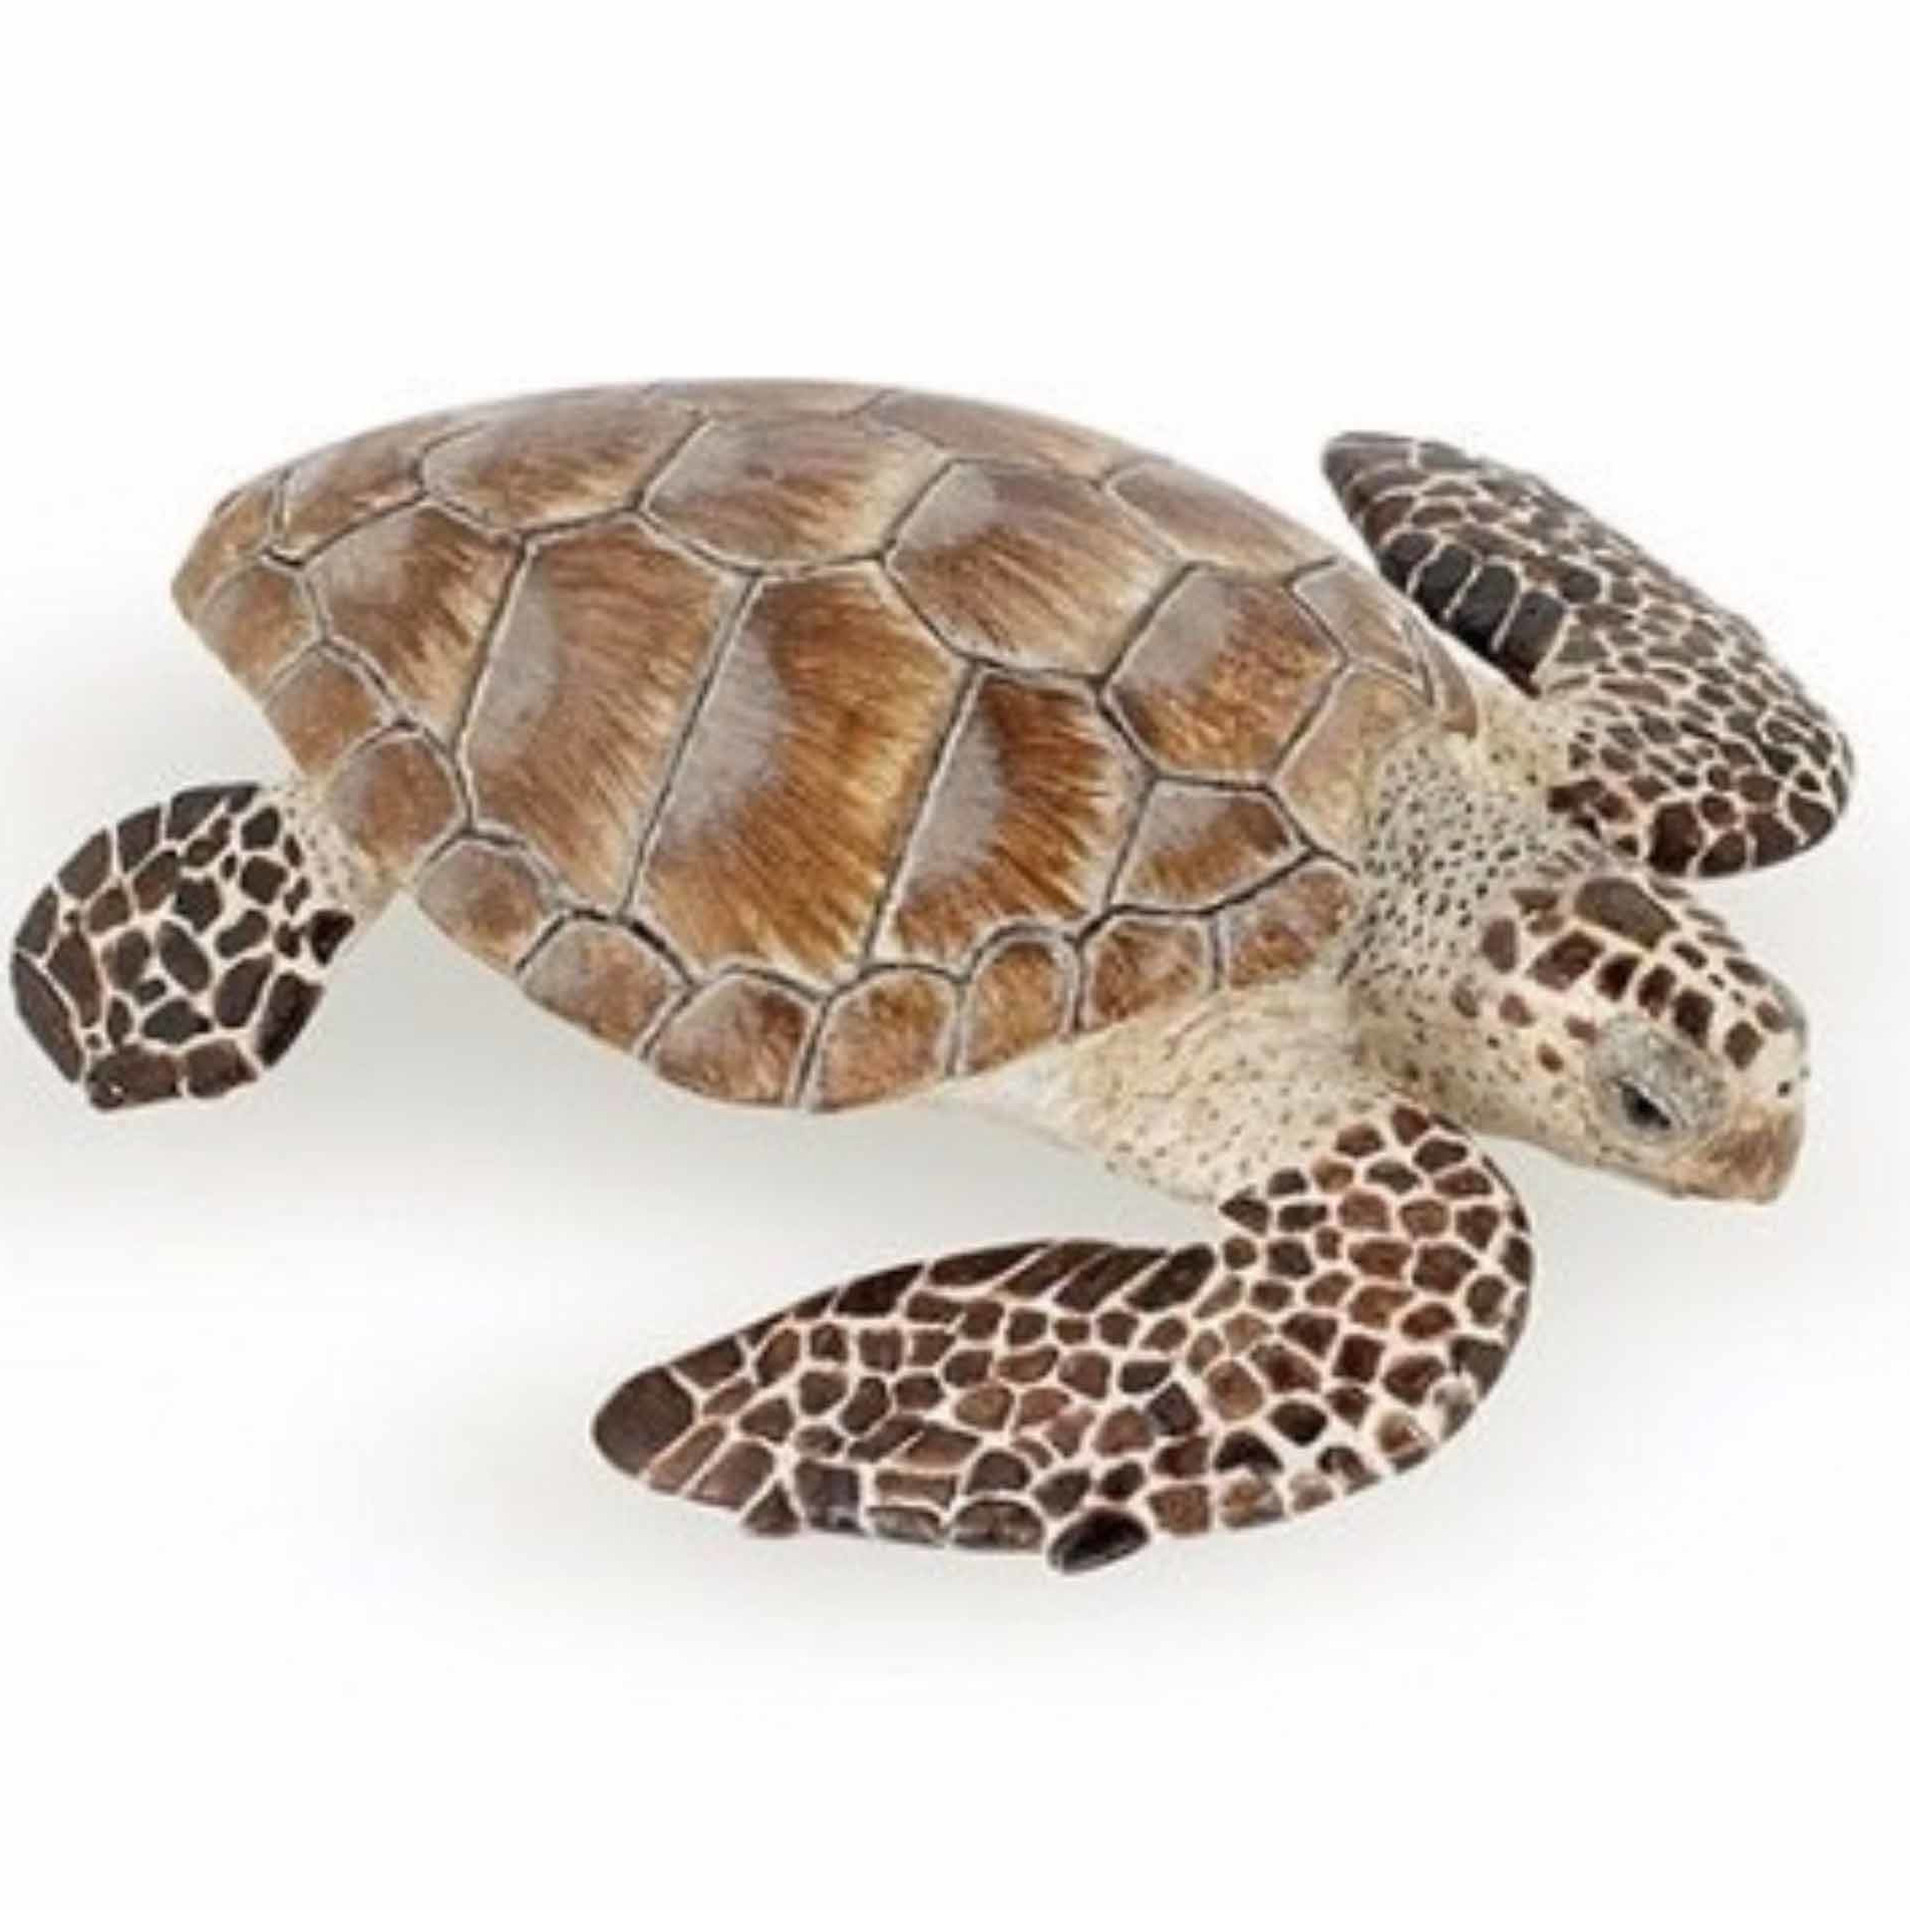 Plastic karetschildpad speeldiertje 7,5 cm (bron: Oranjediscounter)